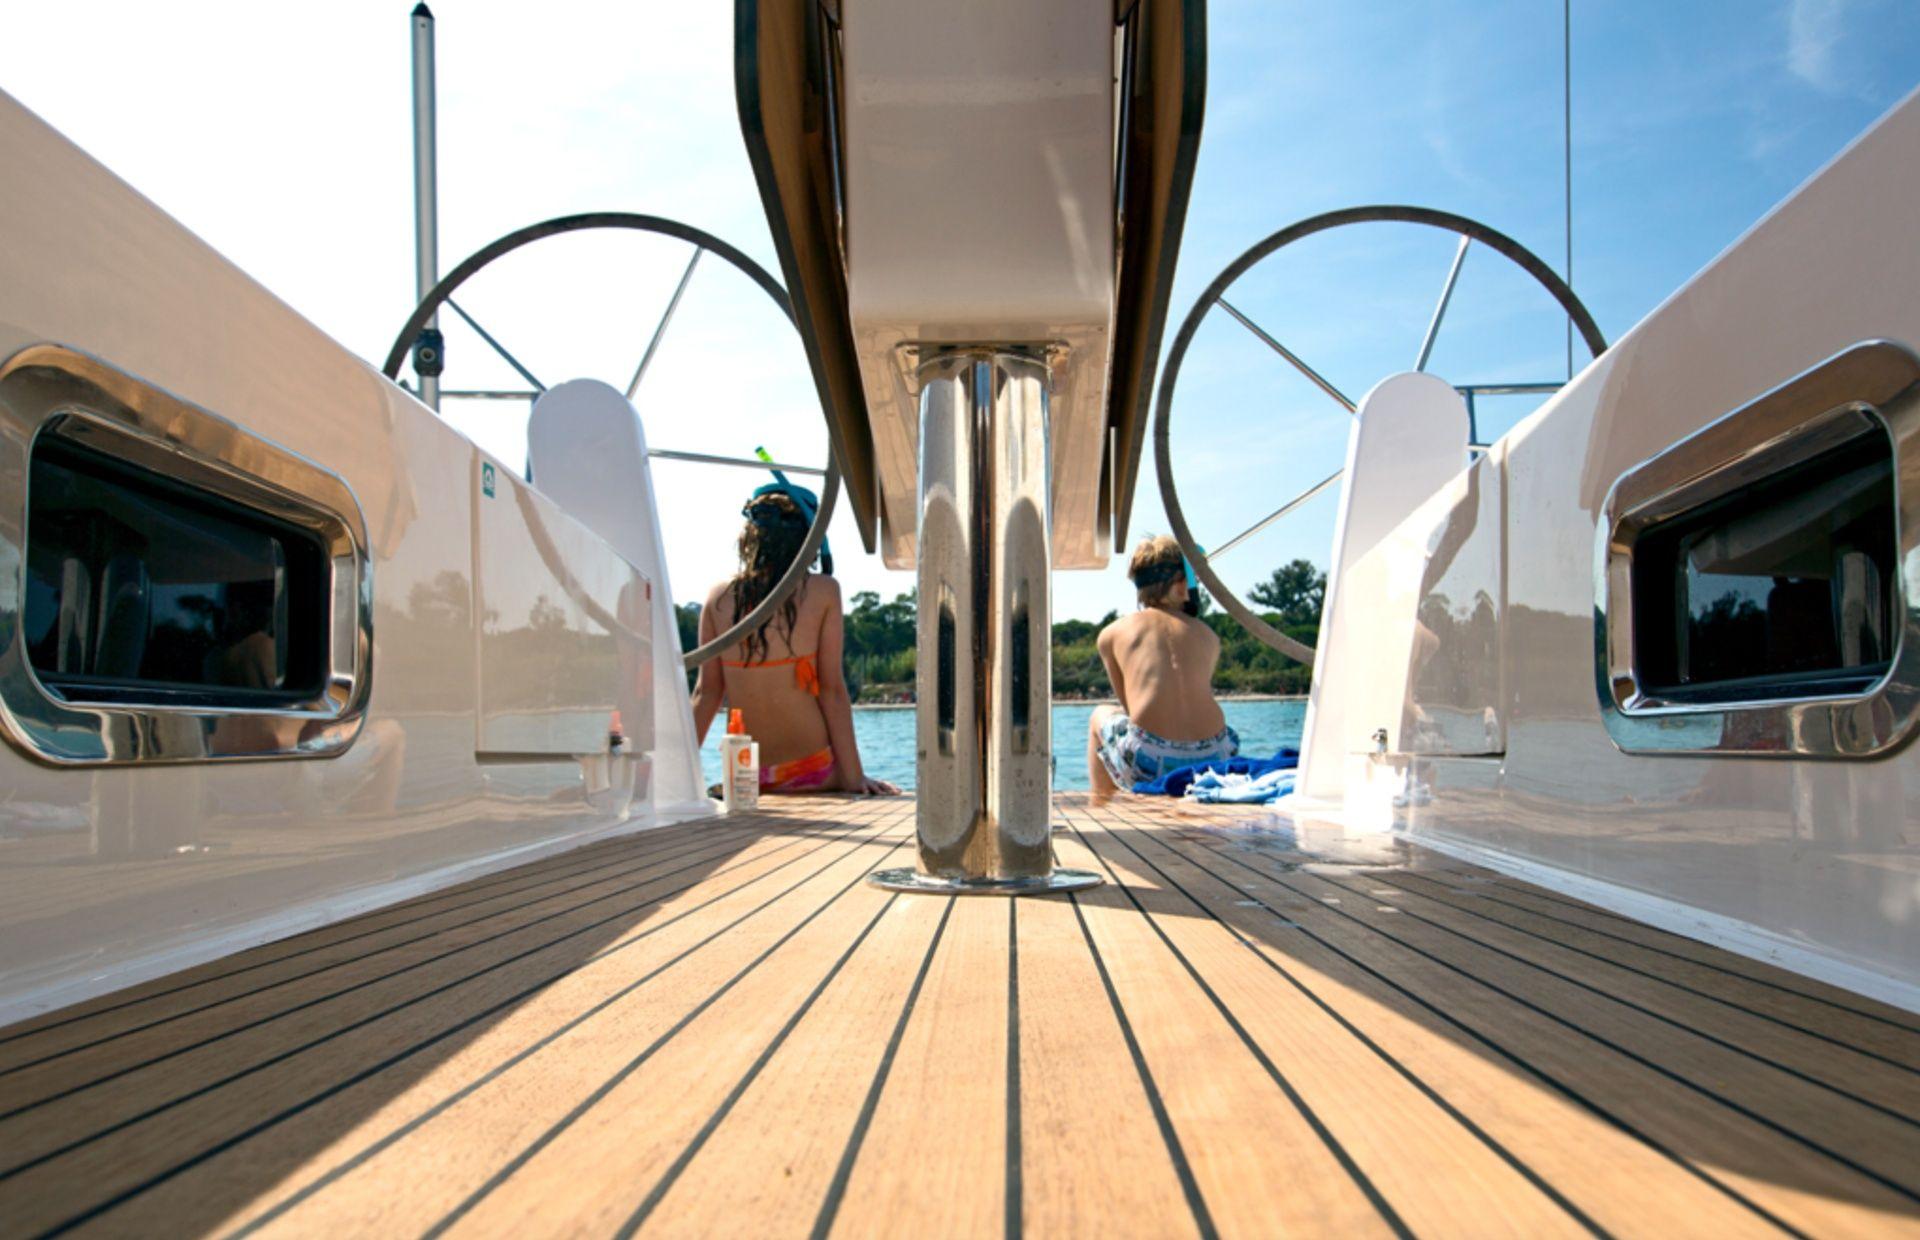 https://media.insailing.com/boat/adriatic-challenge/image_1568992343326.jpg